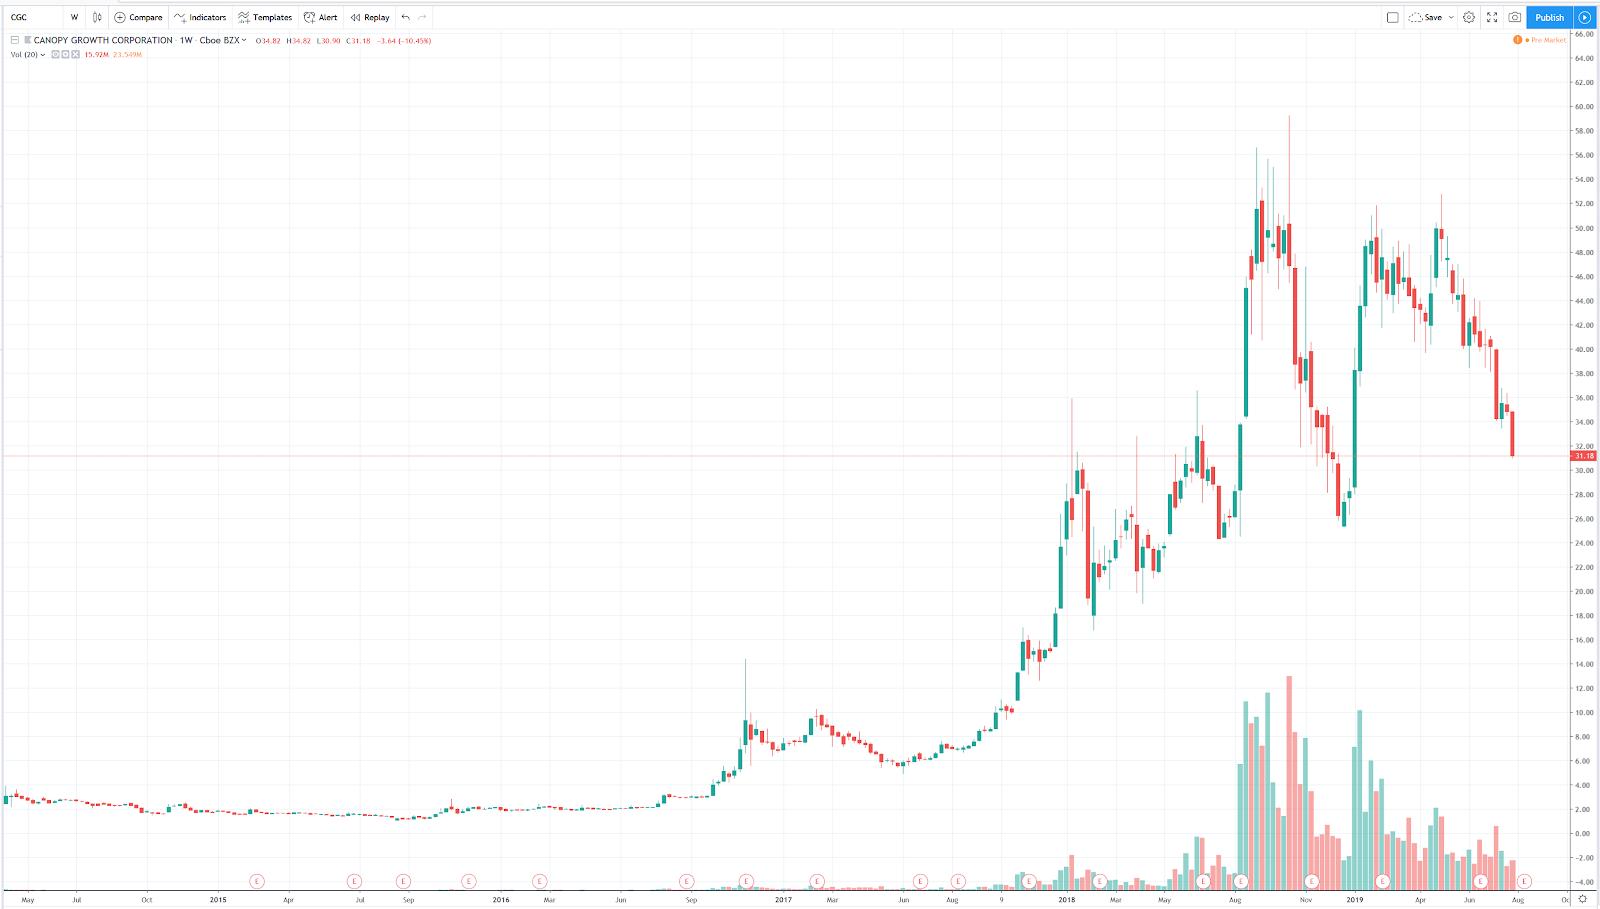 How to Buy Canopy Growth Stock: History, Stock Price & More • Benzinga